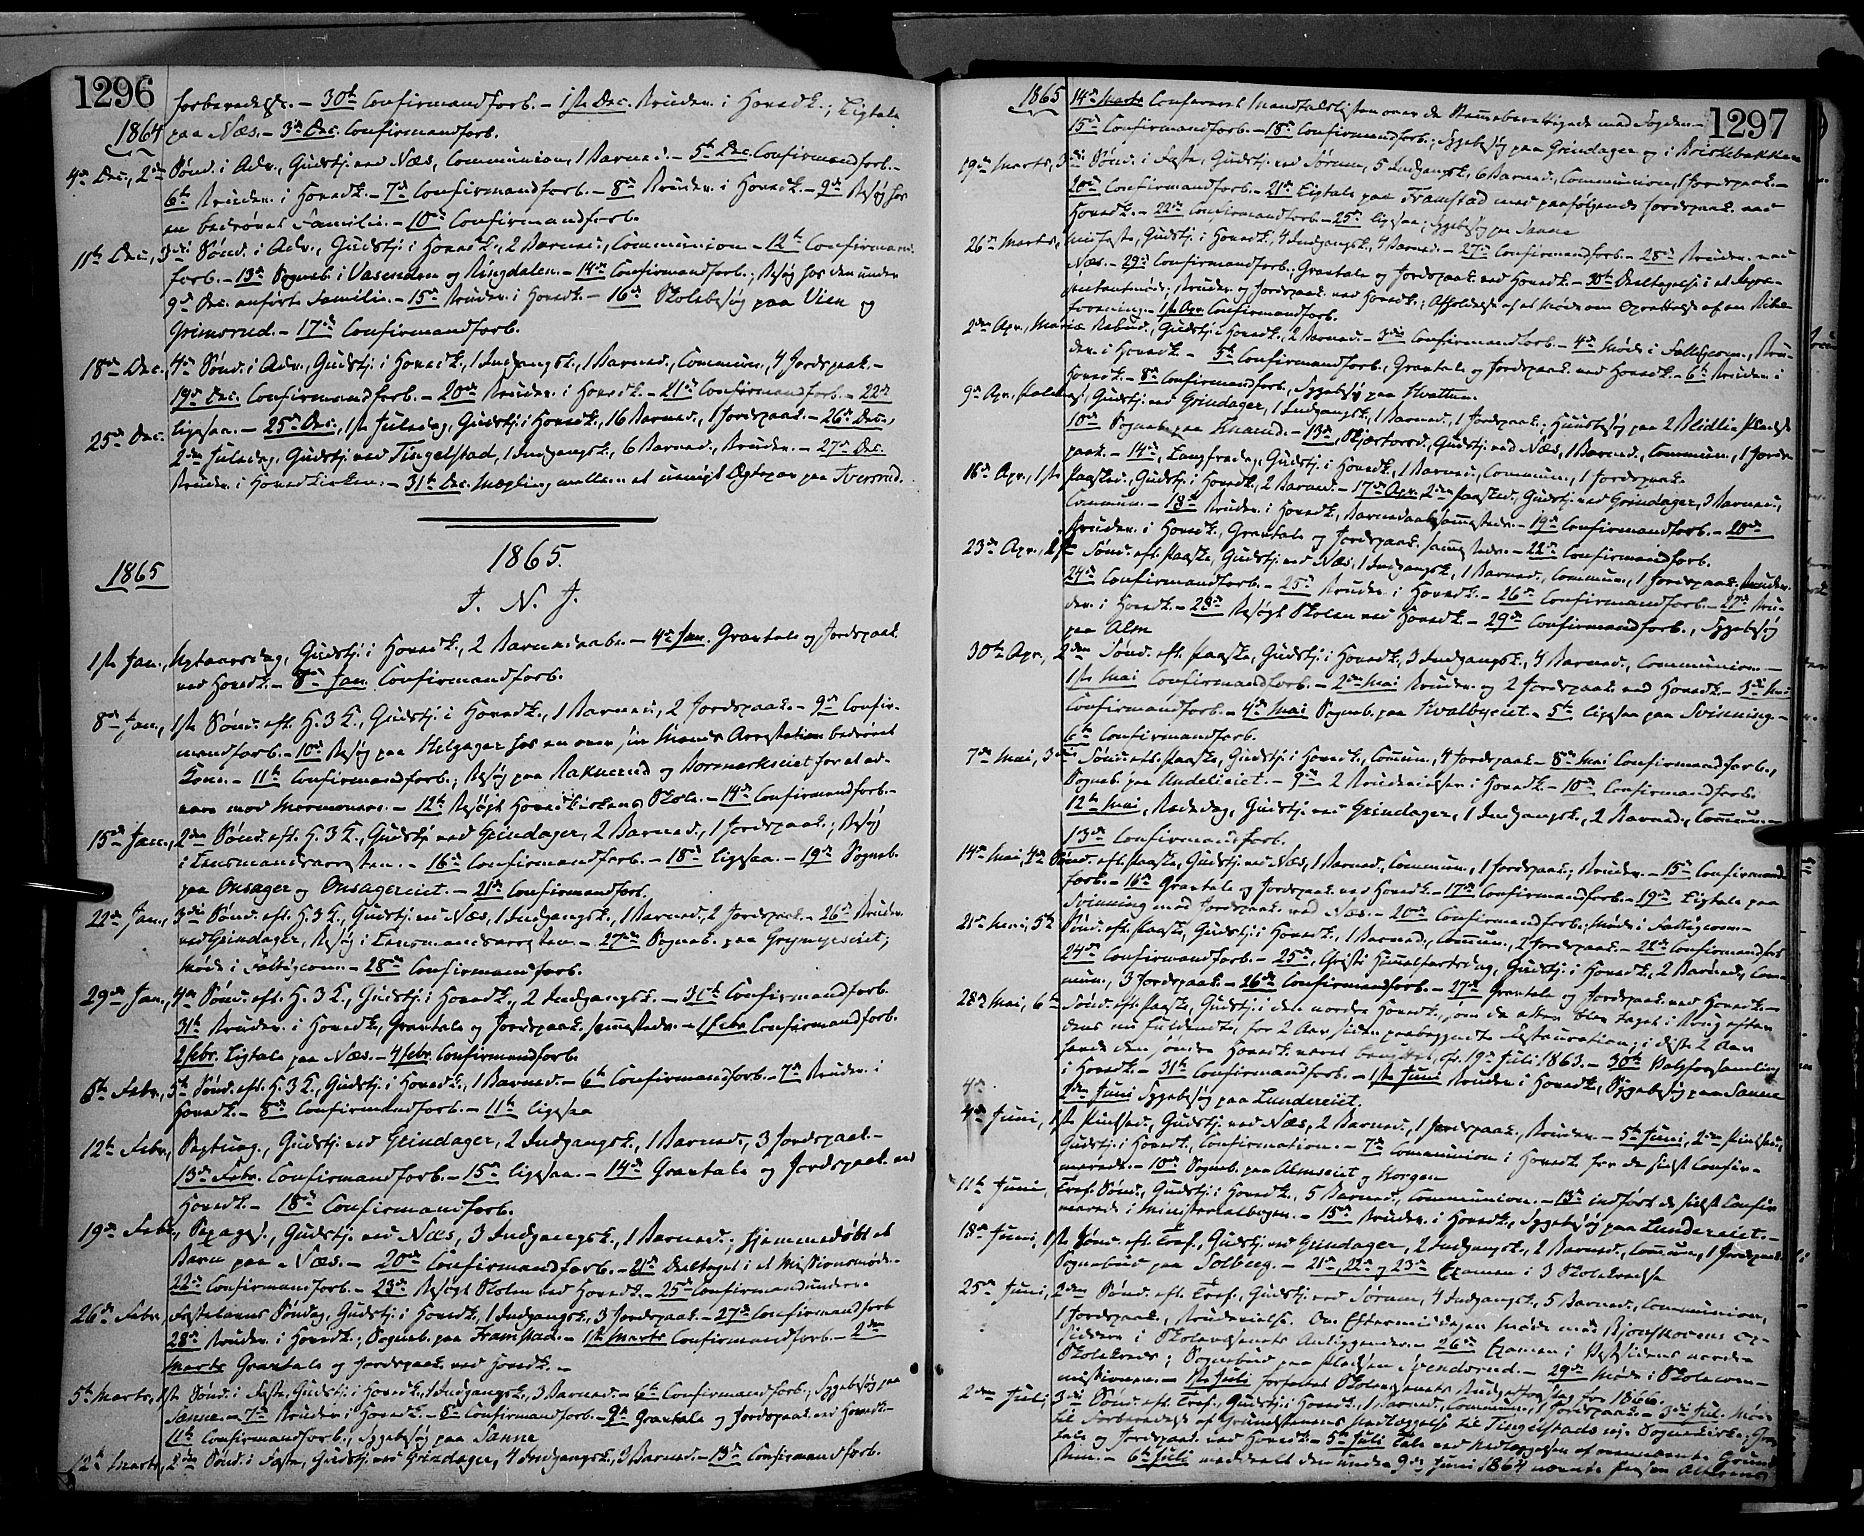 SAH, Gran prestekontor, Ministerialbok nr. 12, 1856-1874, s. 1296-1297